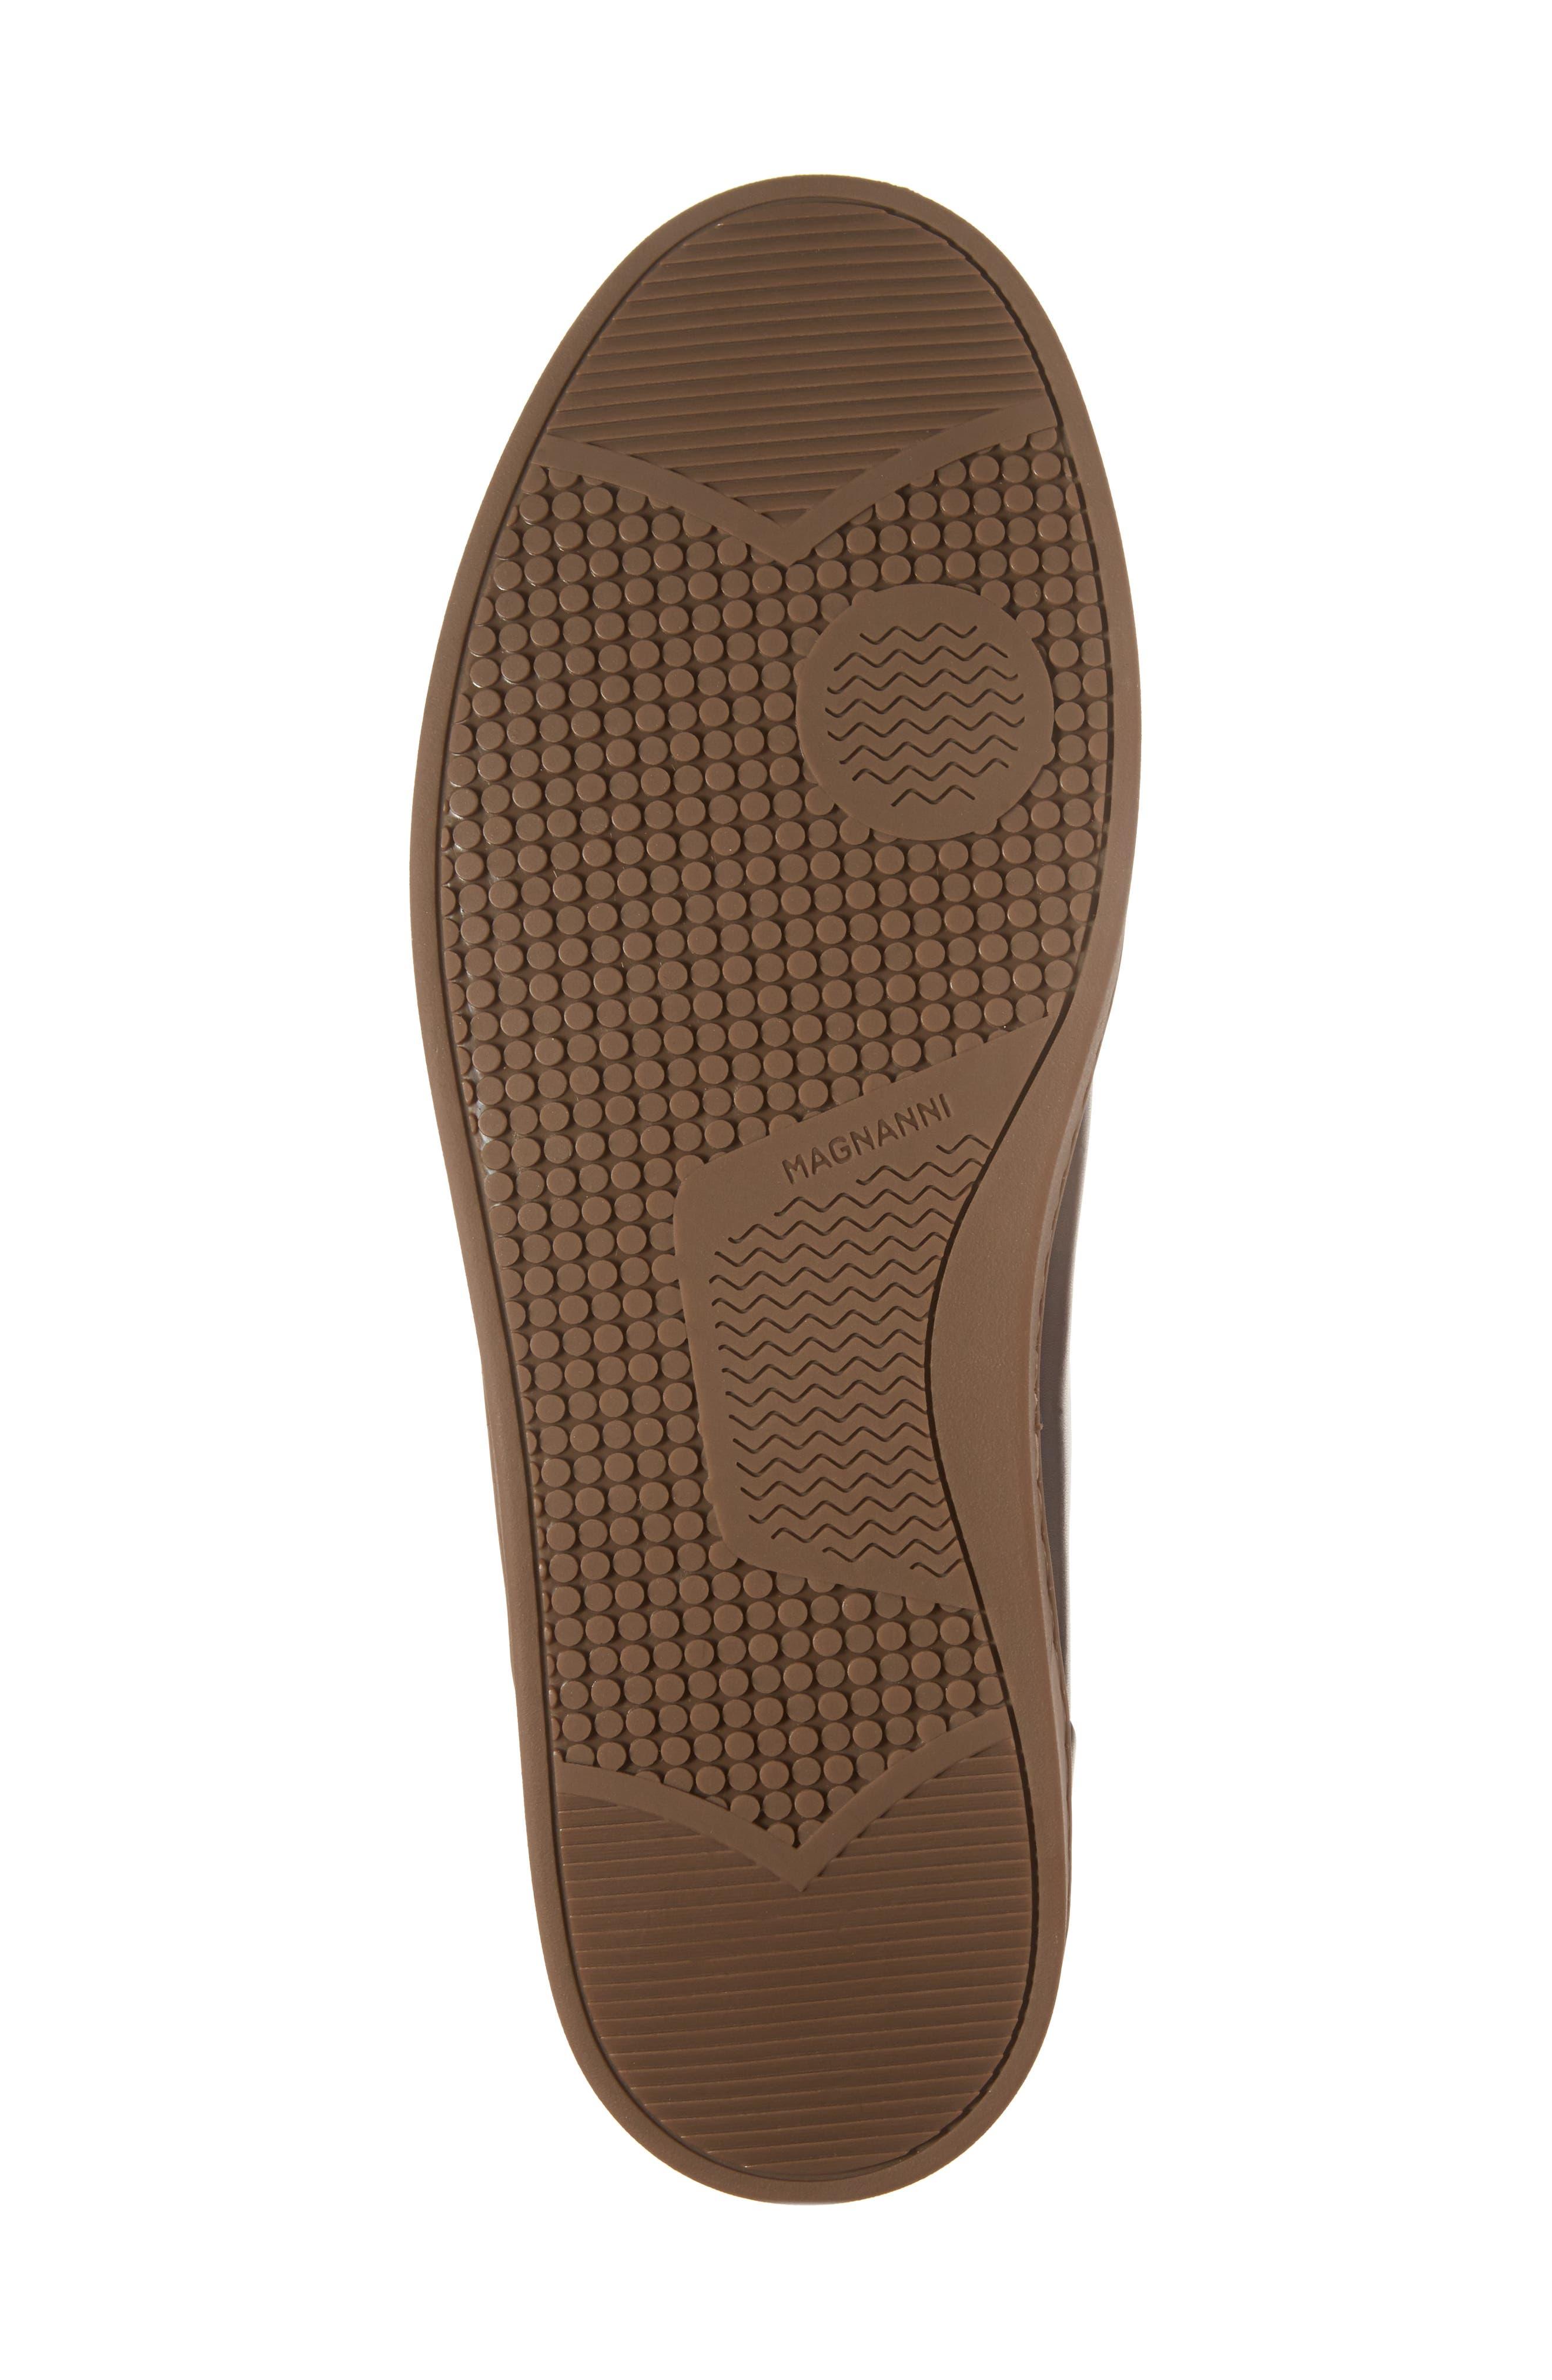 Carmel Sneaker,                             Alternate thumbnail 6, color,                             Mid Brown Leather